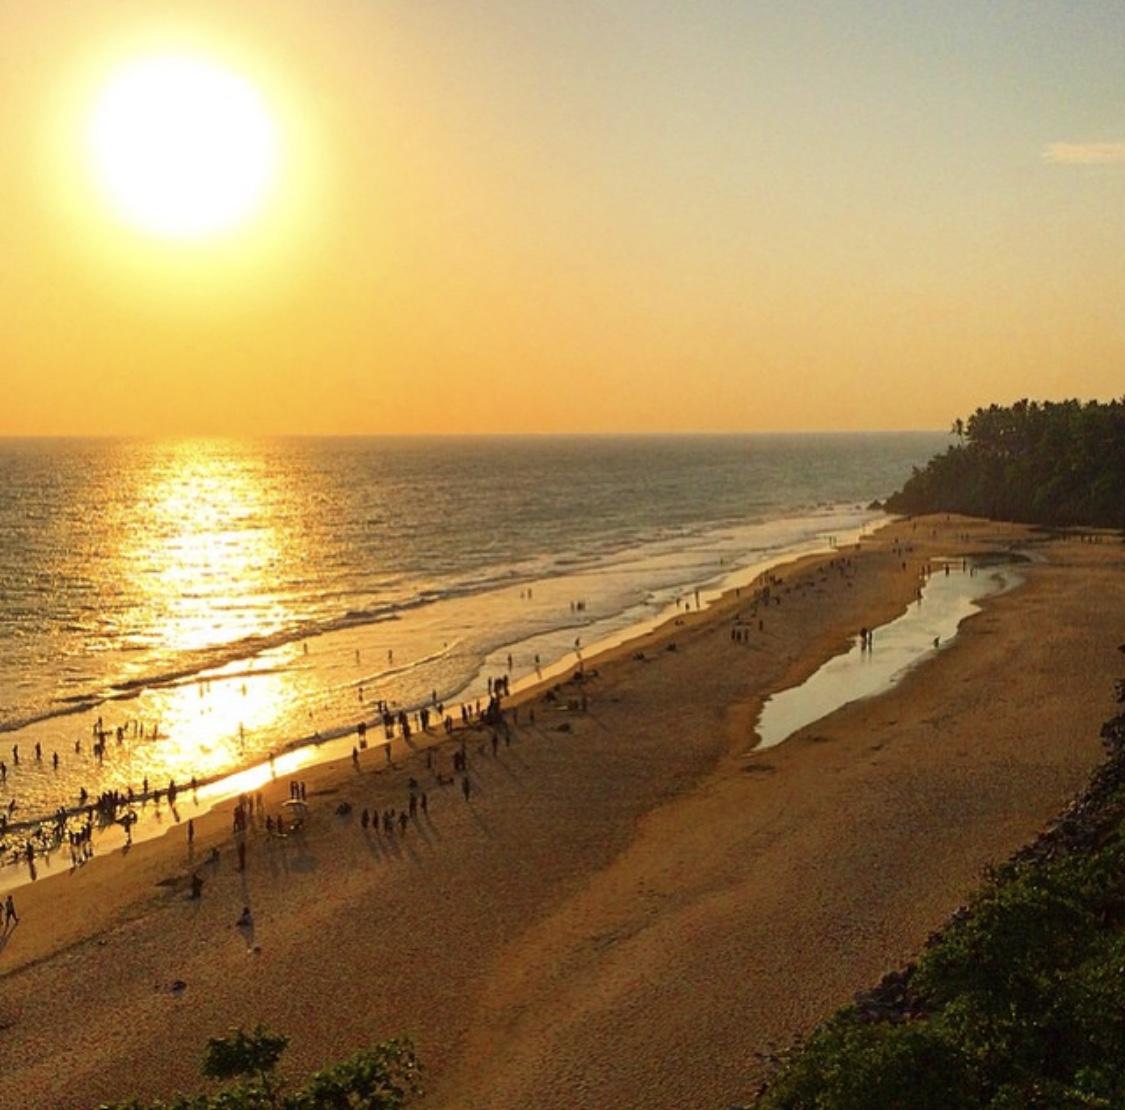 Kerala tourism - a landscape image of Varkala beach at sunset along Kerala's western coastline